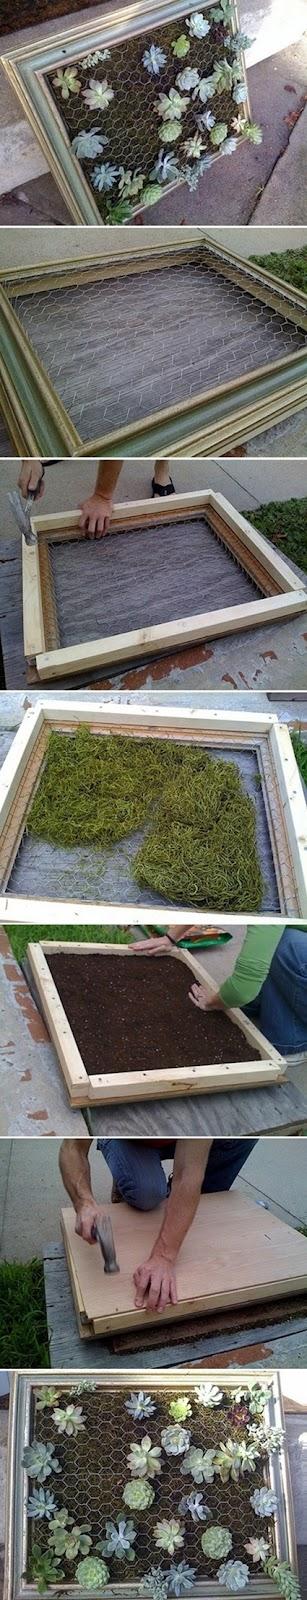 how to make succulents in a frame, DIY succulents, hur man gör en succulenttavla, tavla med succulenter, vertical garden for succulents